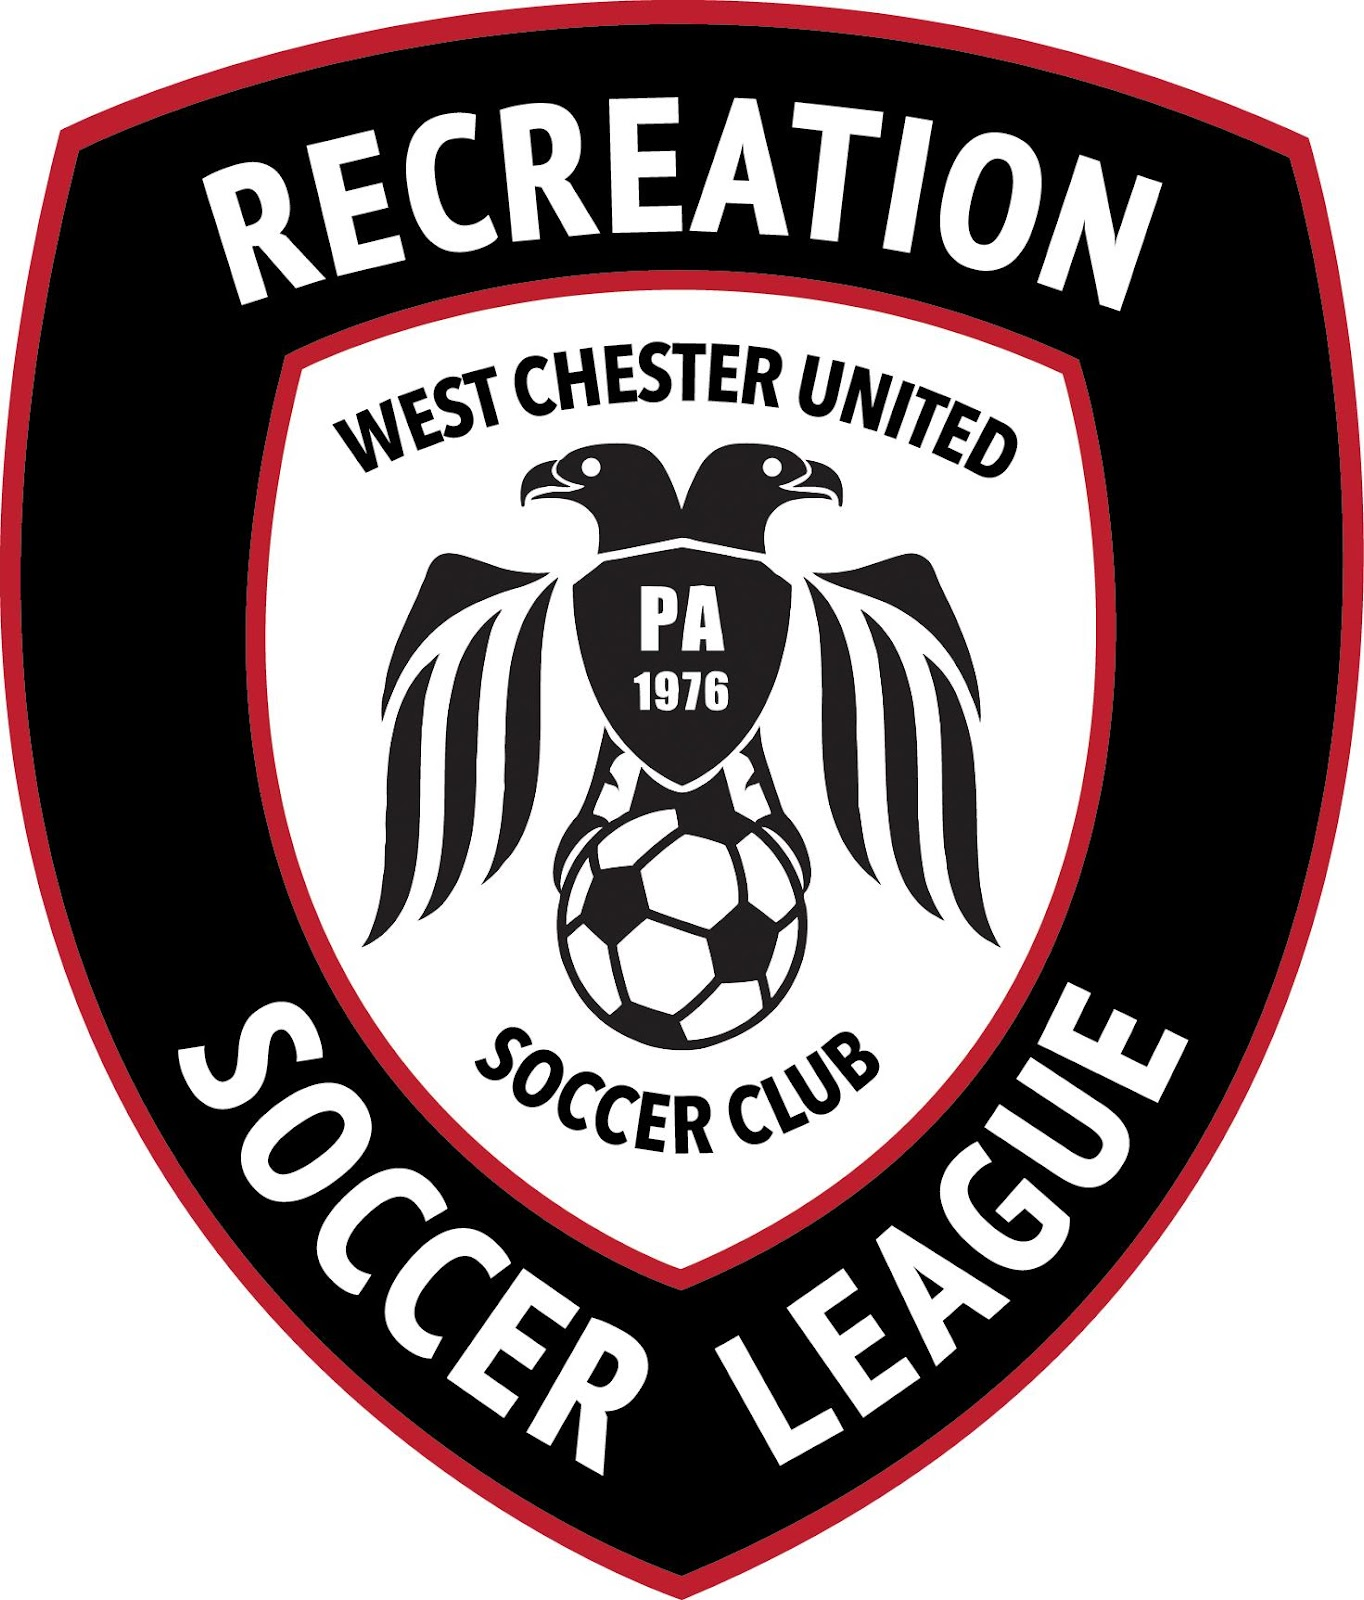 F:\Recreation Leagues\Recreation_2016_present\Recreation League\Logos\Rec_logo2014_final.jpg